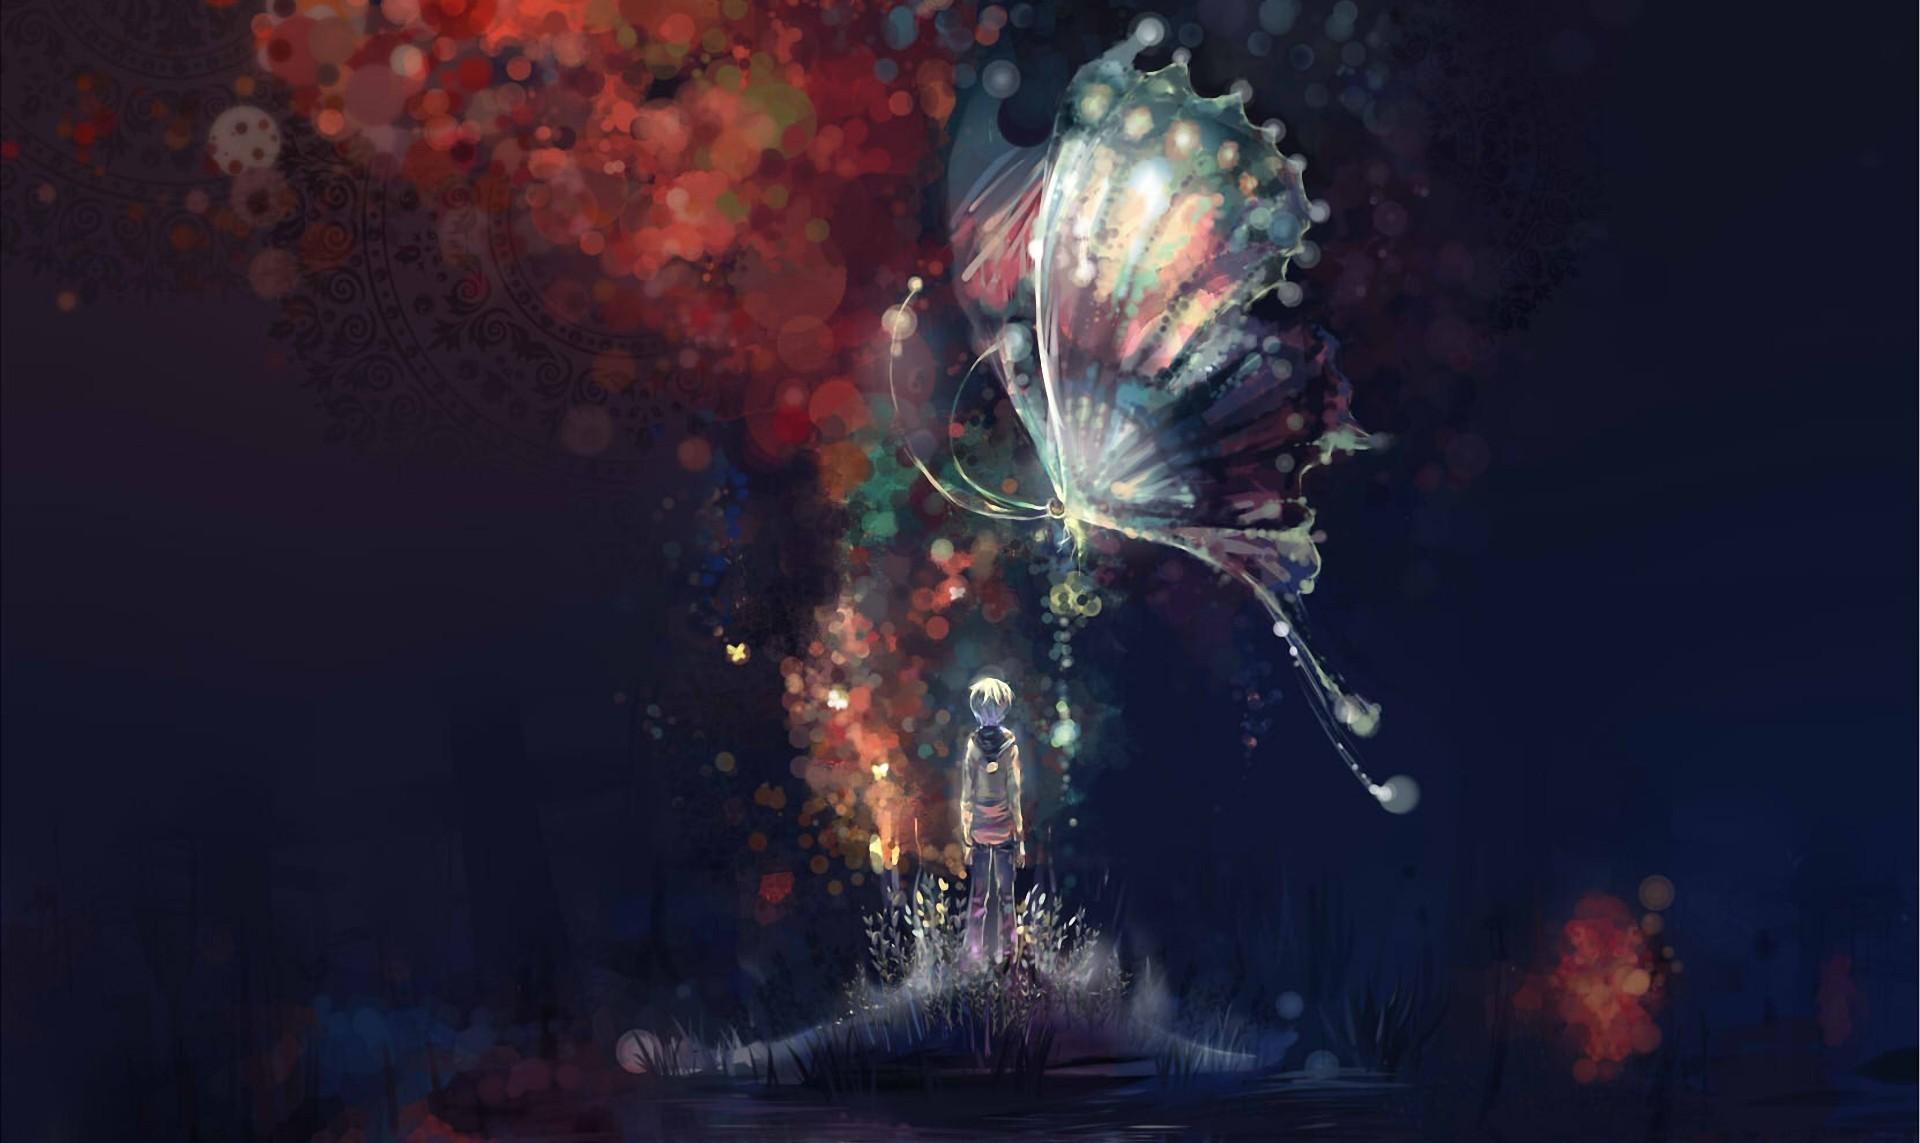 art Night Abstract Butterfly Boy Island Water Lake Anime 1920x1143